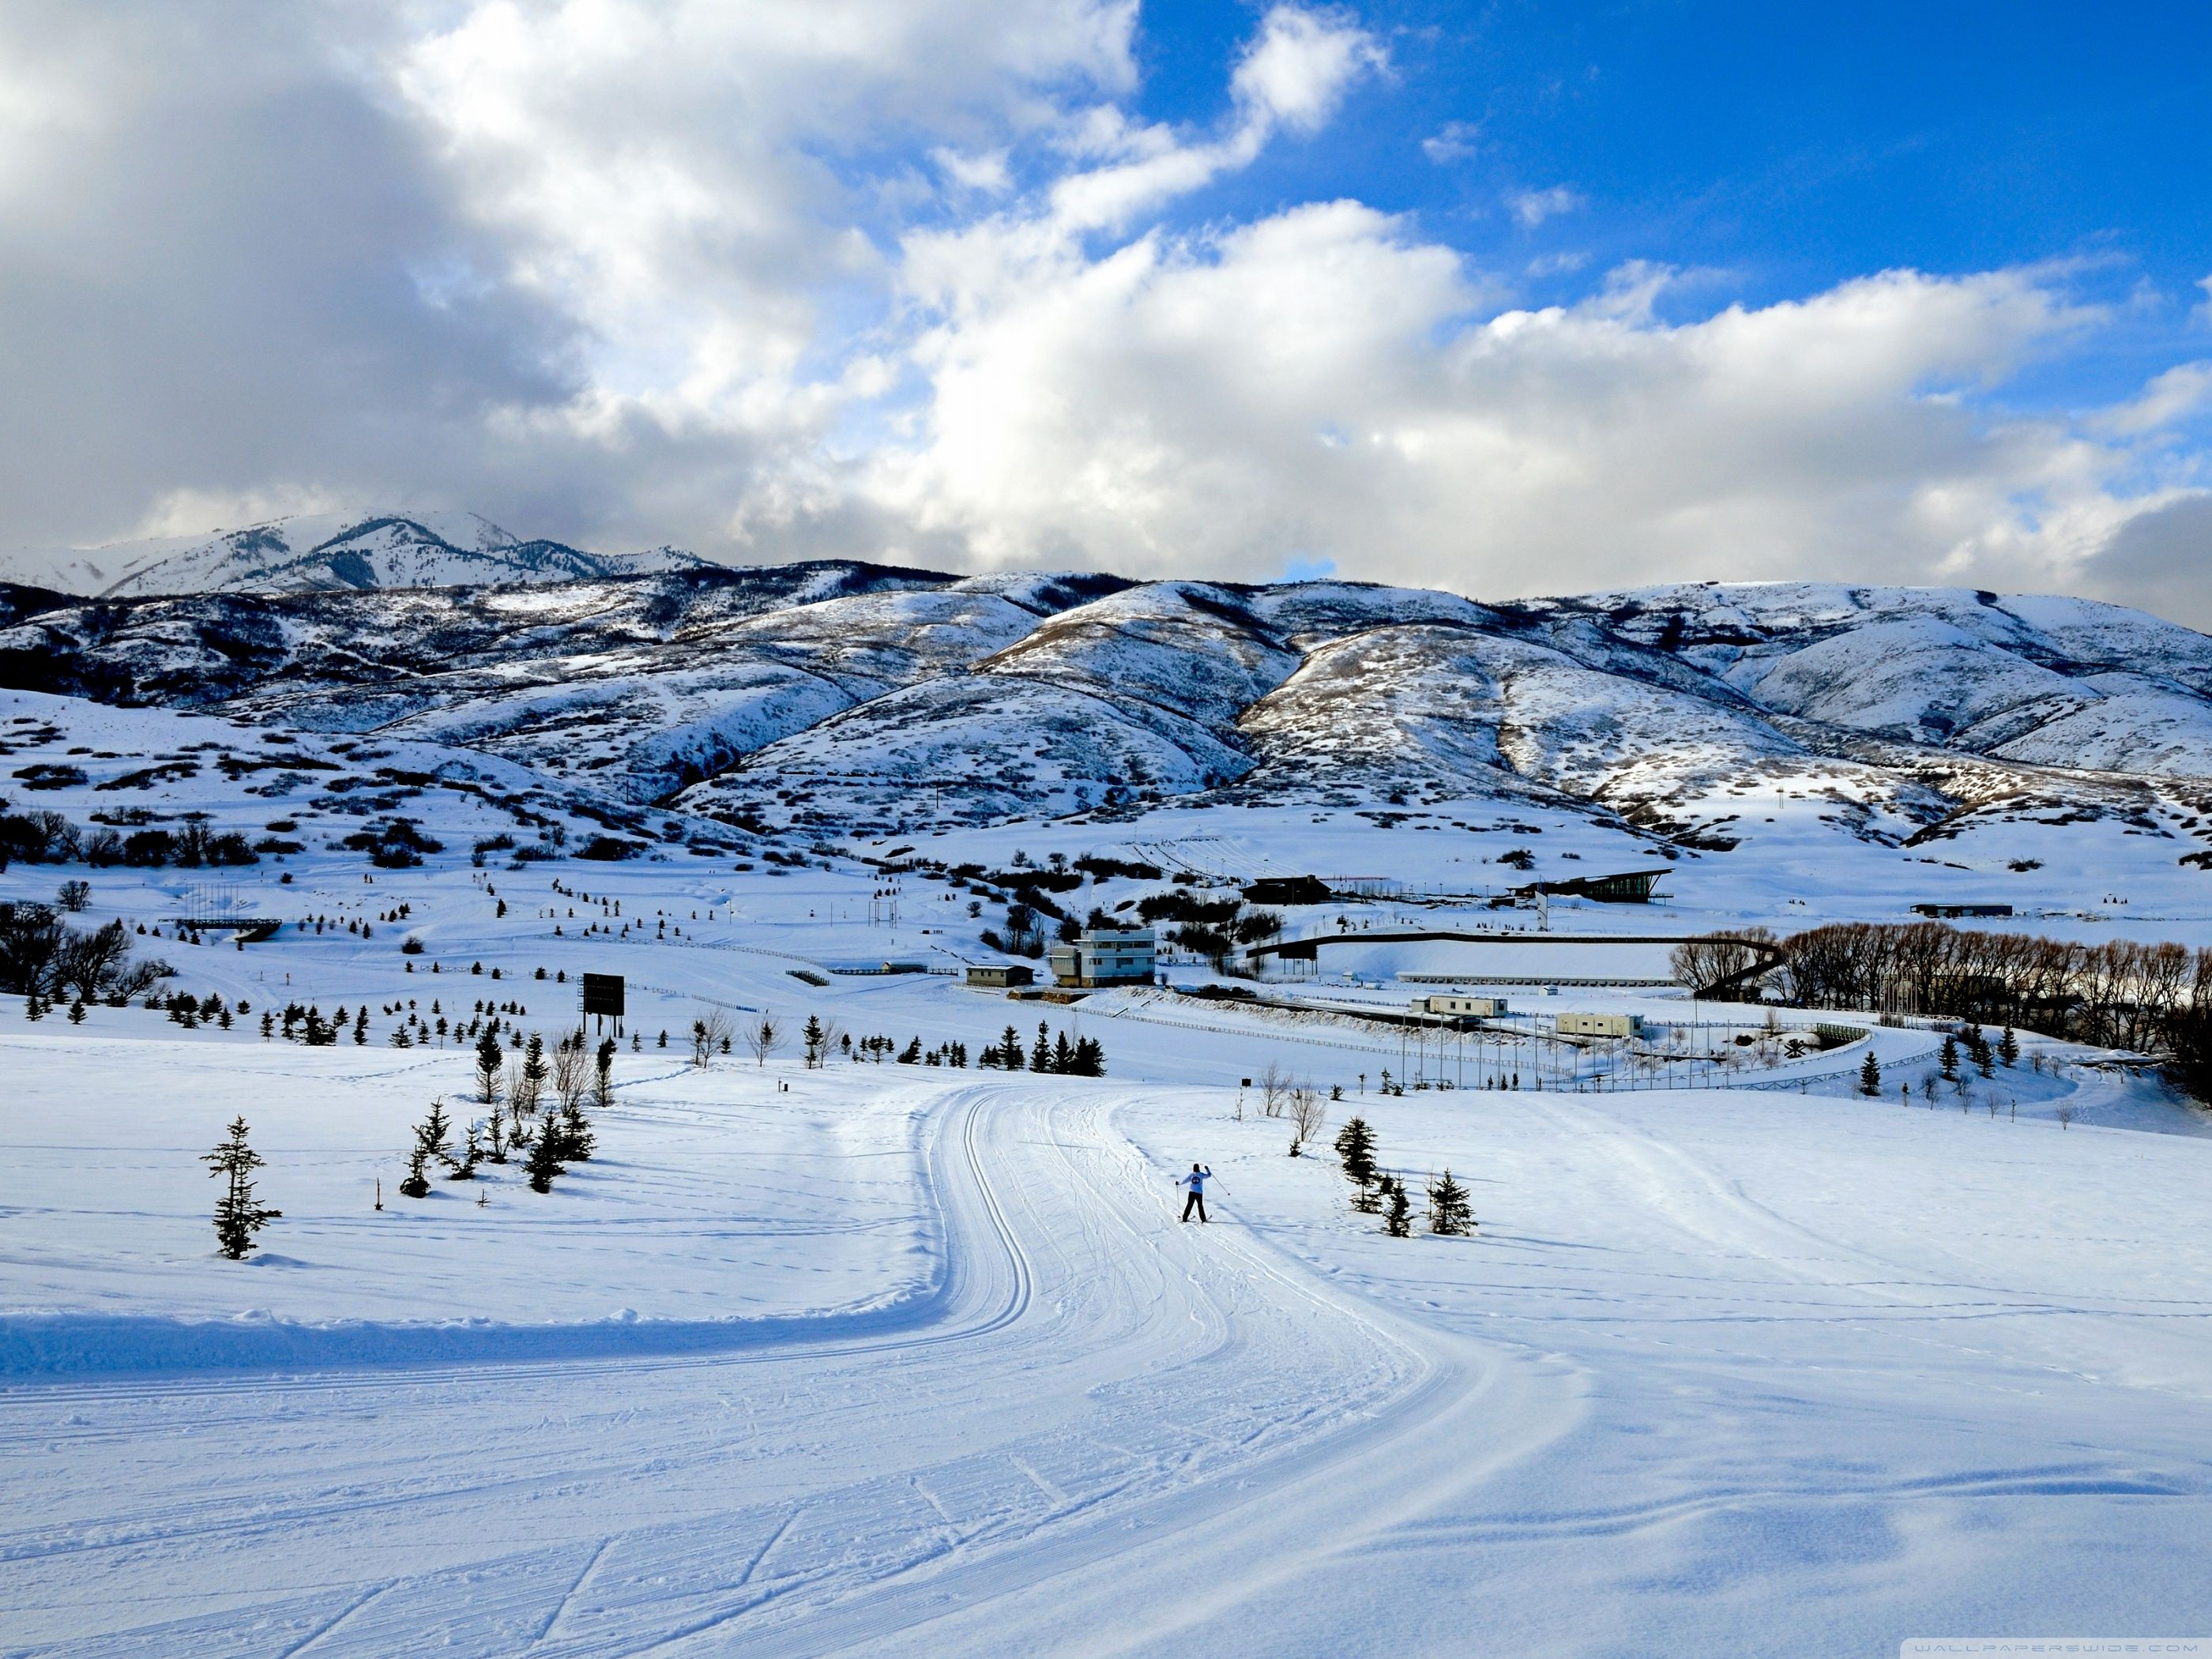 Ski Trails Wallpapers   Top Ski Trails Backgrounds 2800x2100